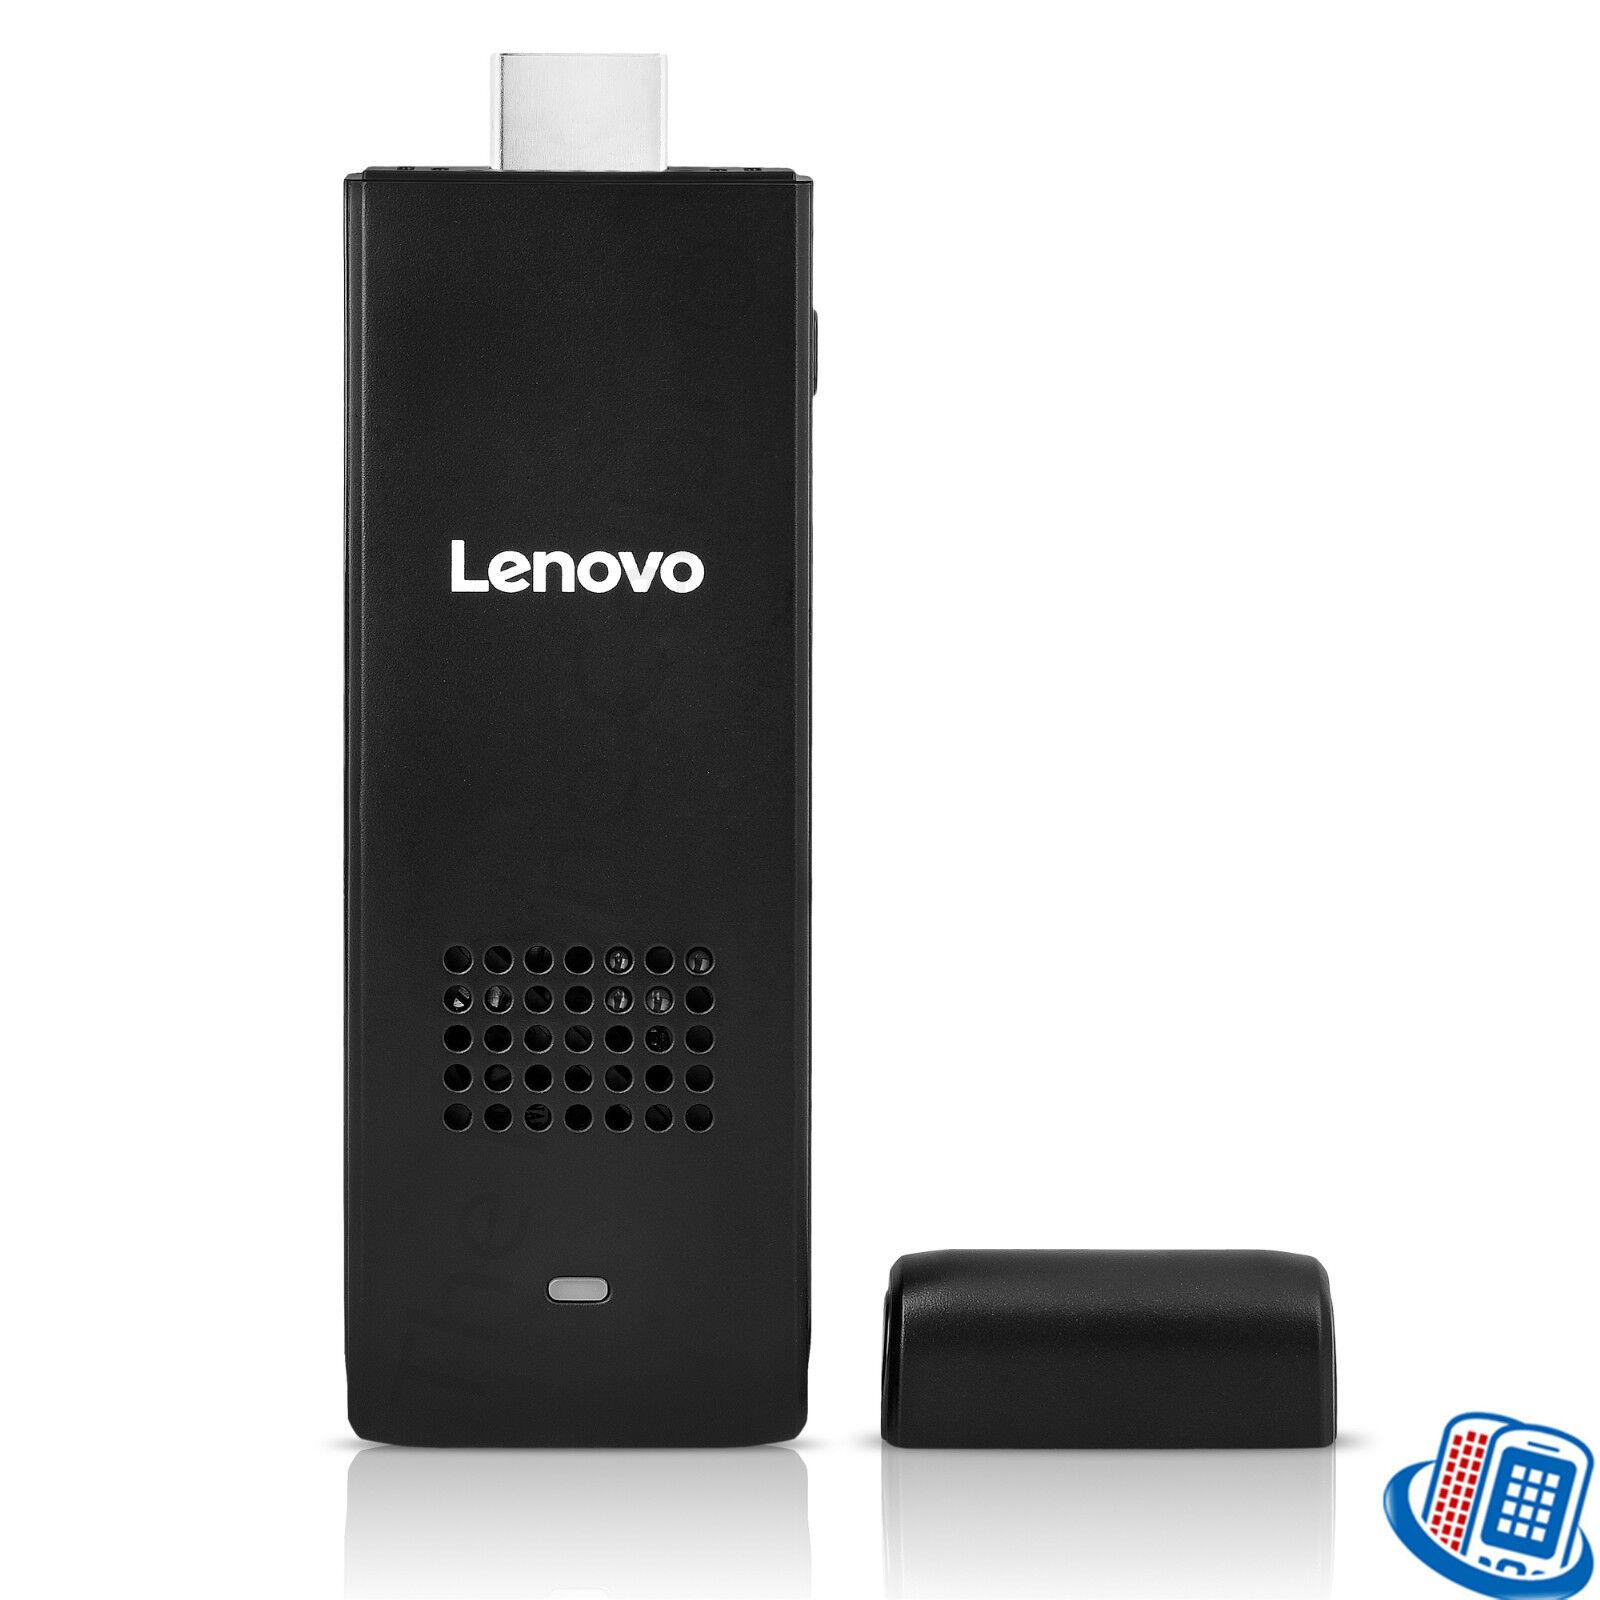 Lenovo Memory Card Reader Driver Download